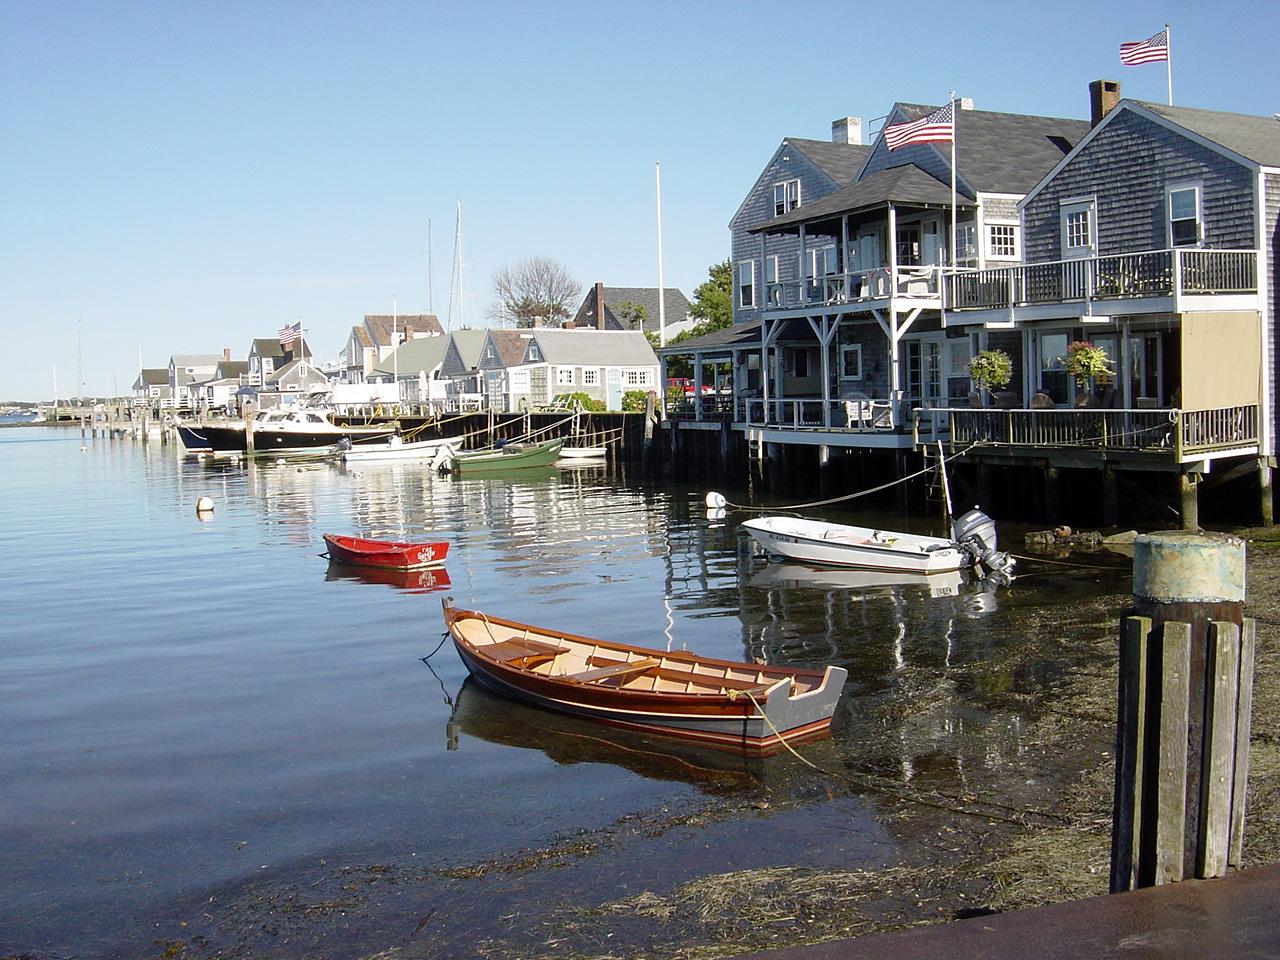 Nantucket, Massachusetts. Photo by Bobak Ha'Eri.